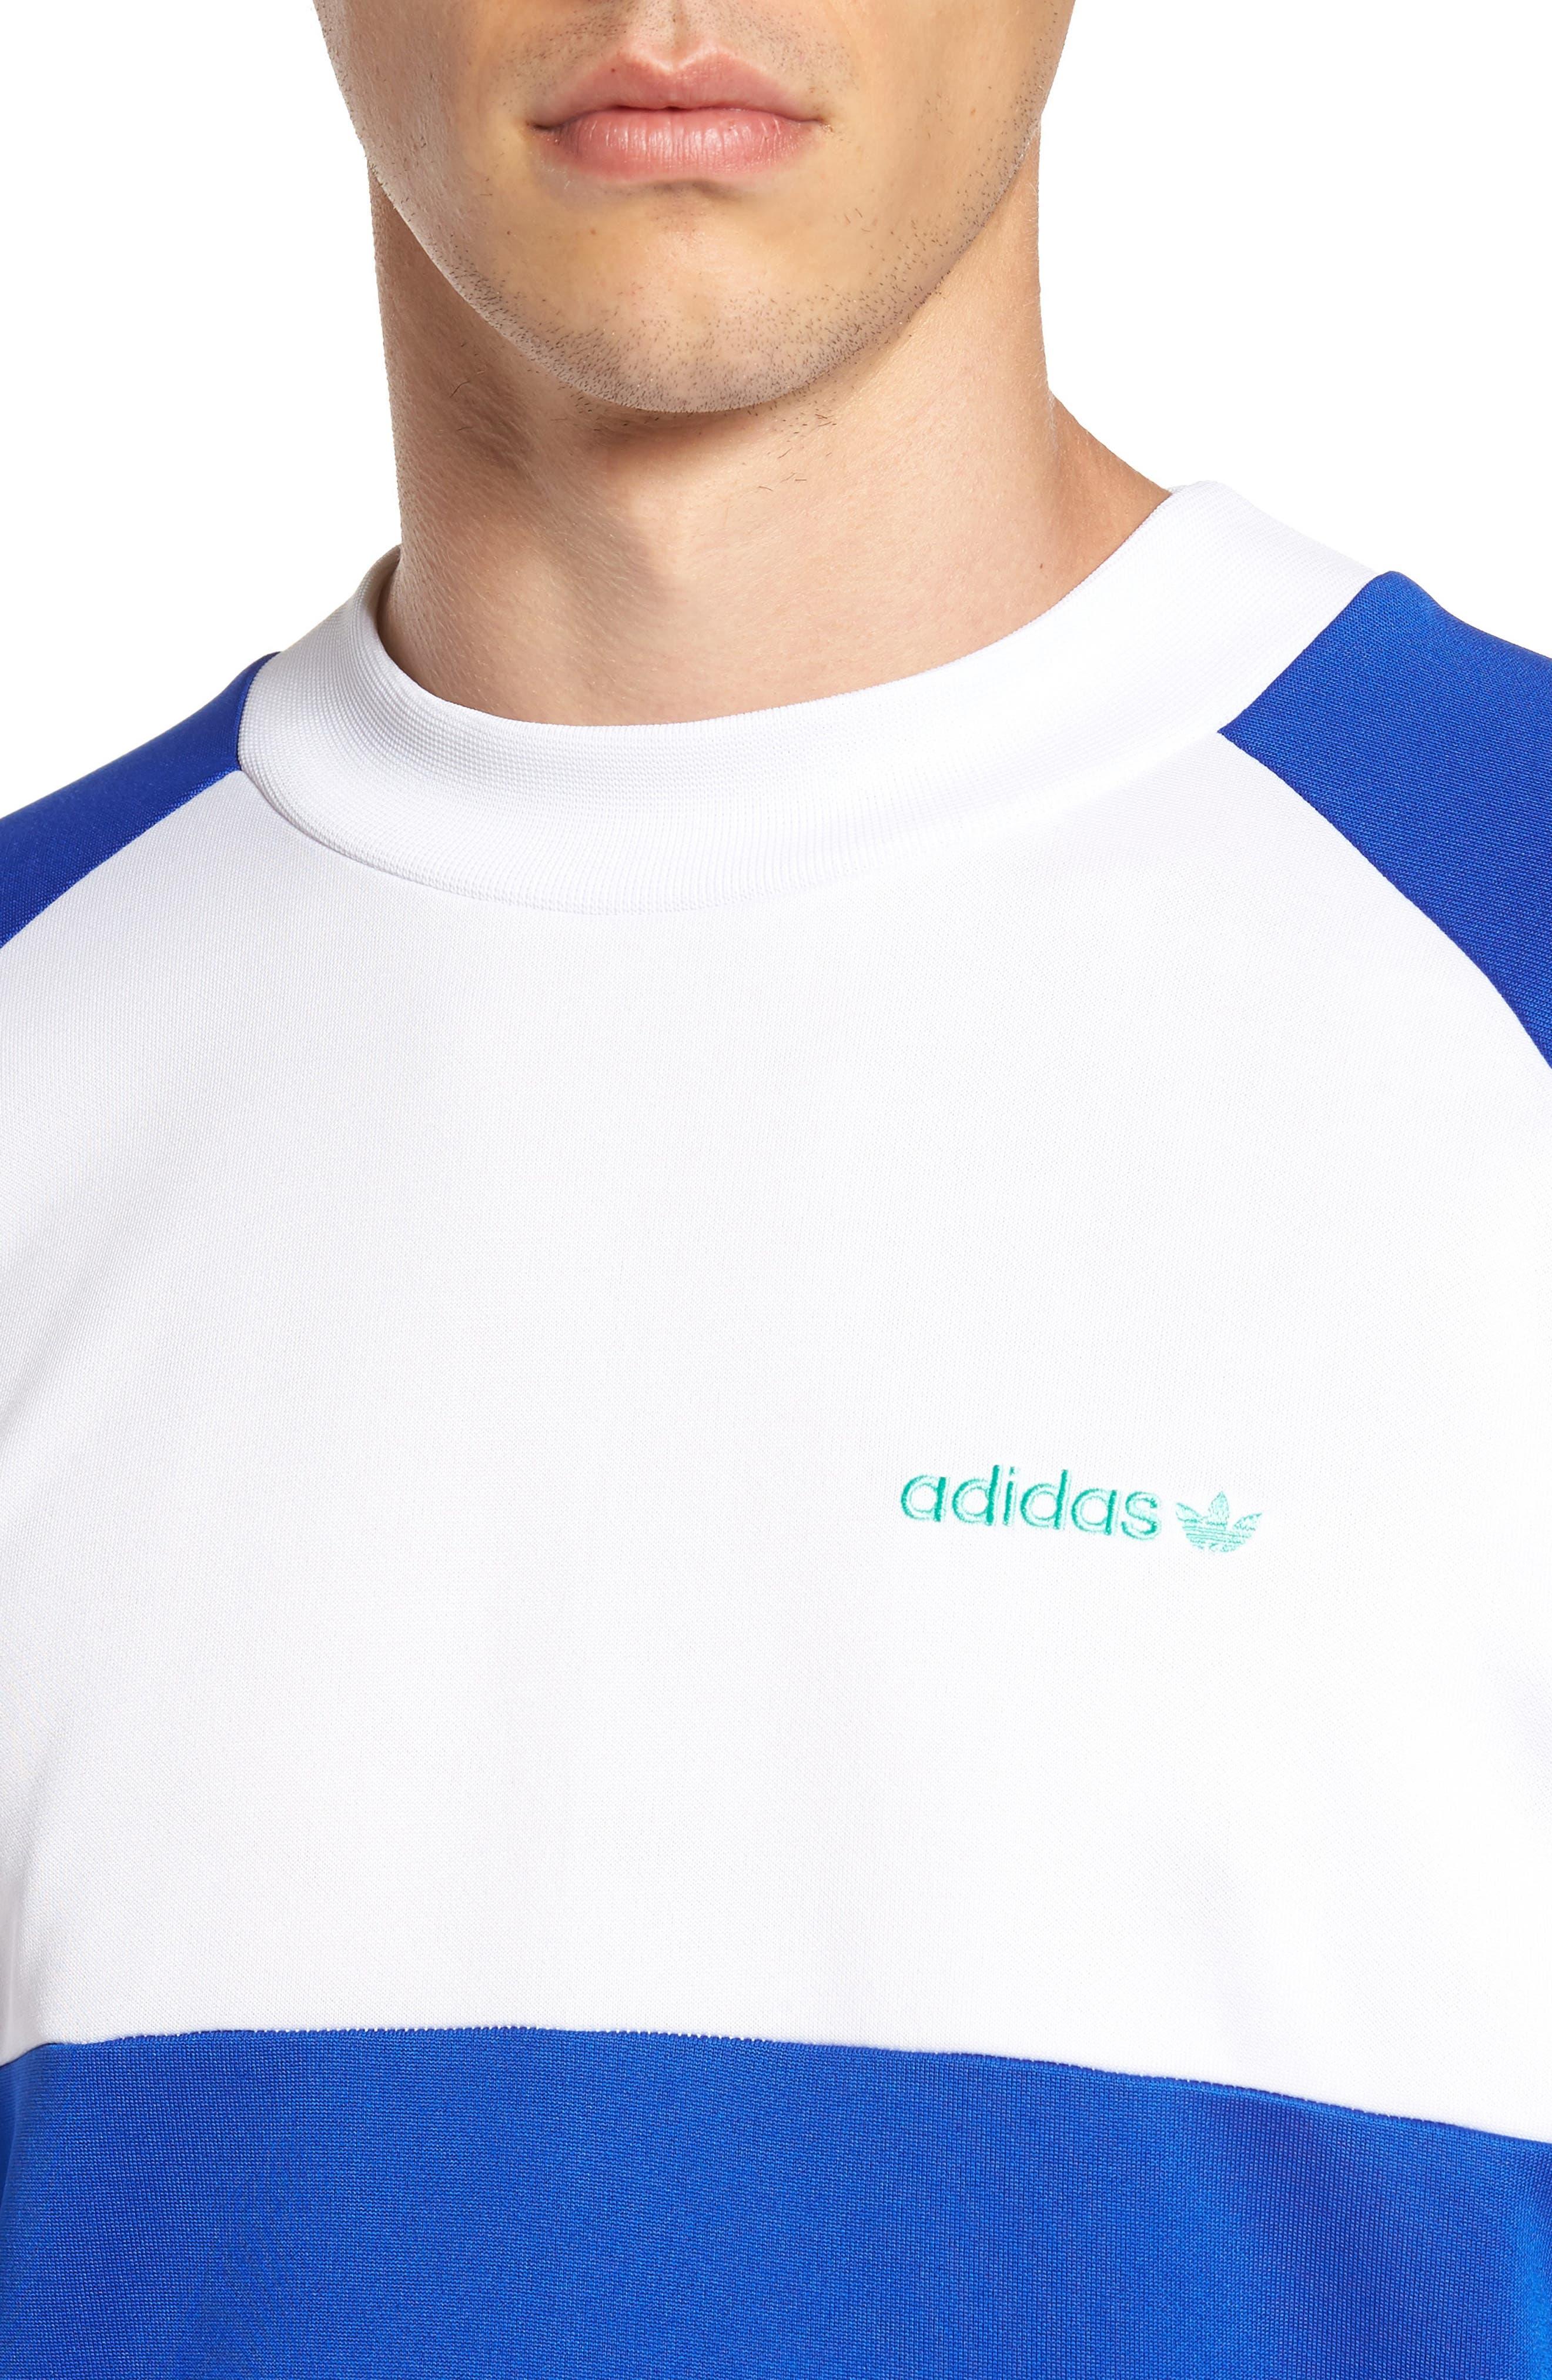 Originals Chop Shop T-Shirt,                             Alternate thumbnail 4, color,                             400